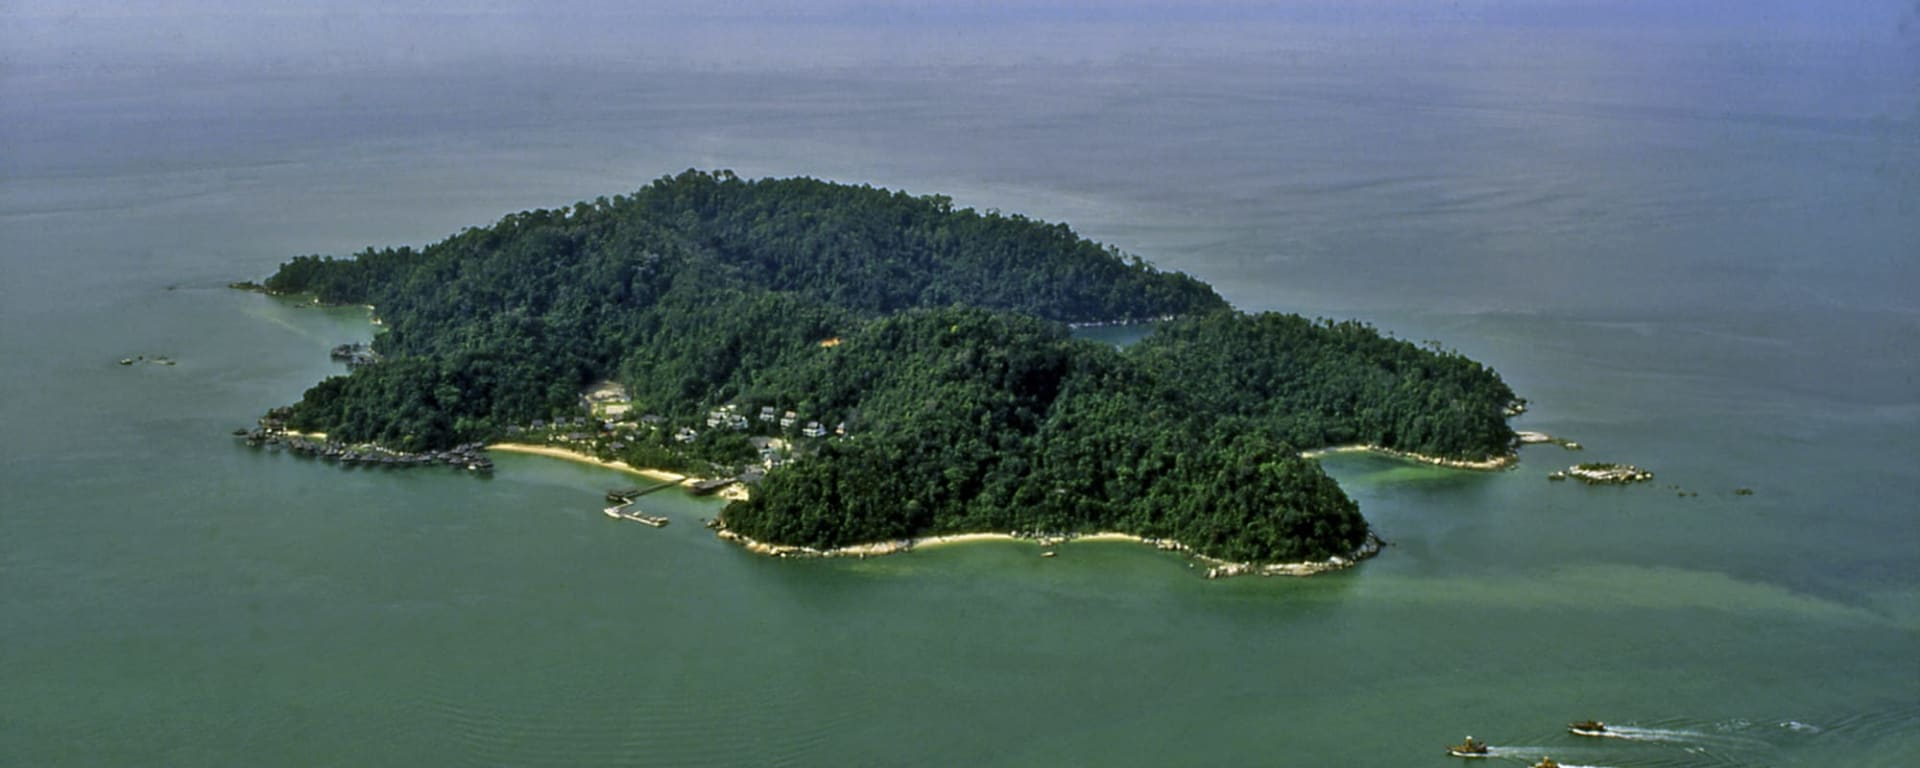 Pangkor Laut Resort in Kuala Lumpur: Pangkor Laut Resort